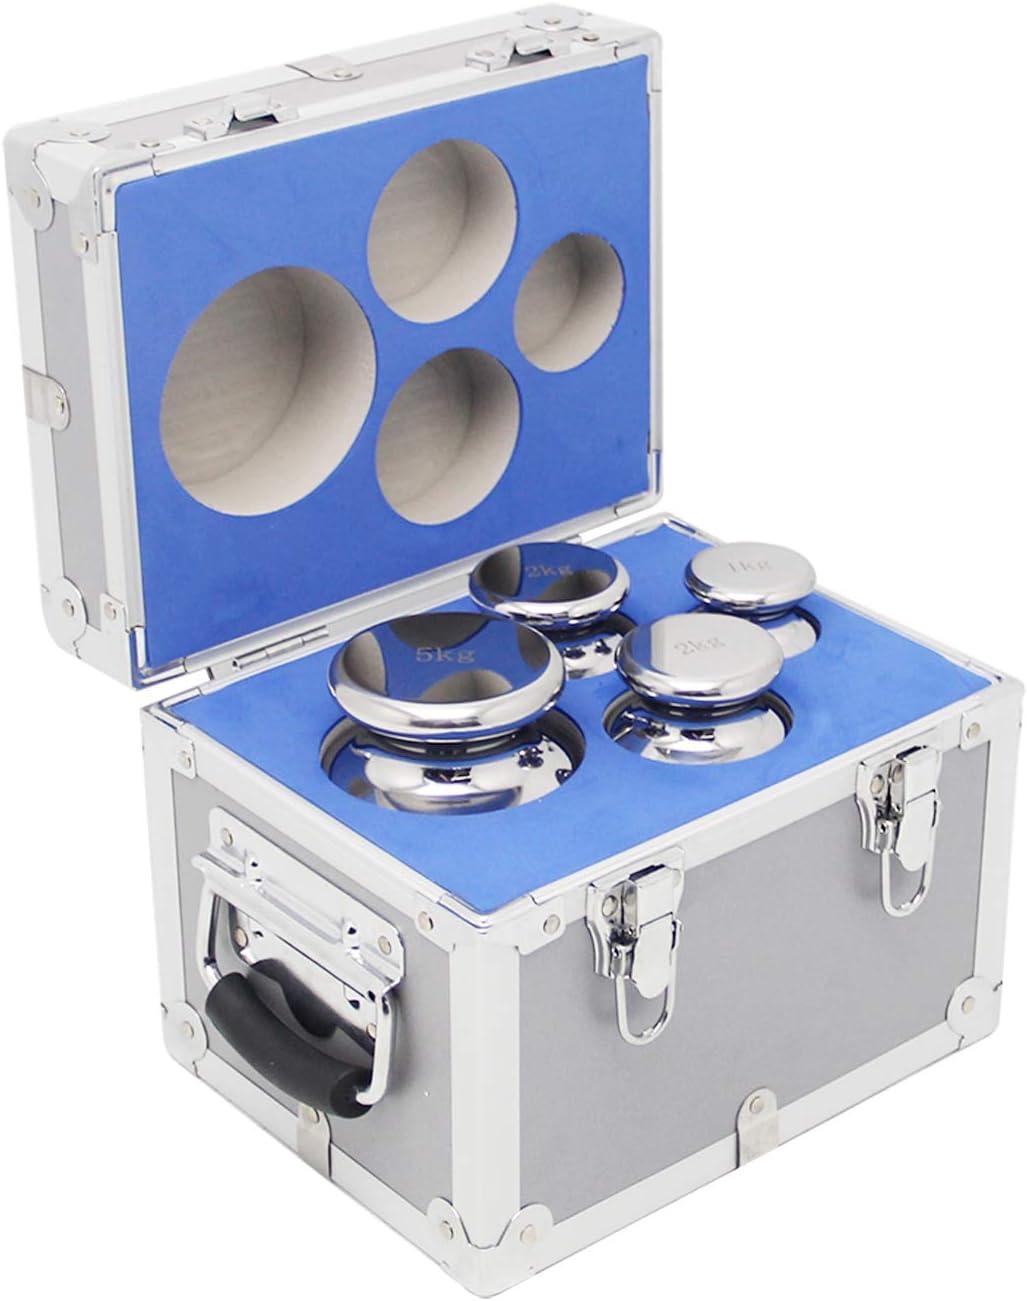 BAOSHISHAN Class M1 Balance Scale Calibration Weight 爆売りセール開催中 Kit ラッピング無料 Set 1KG